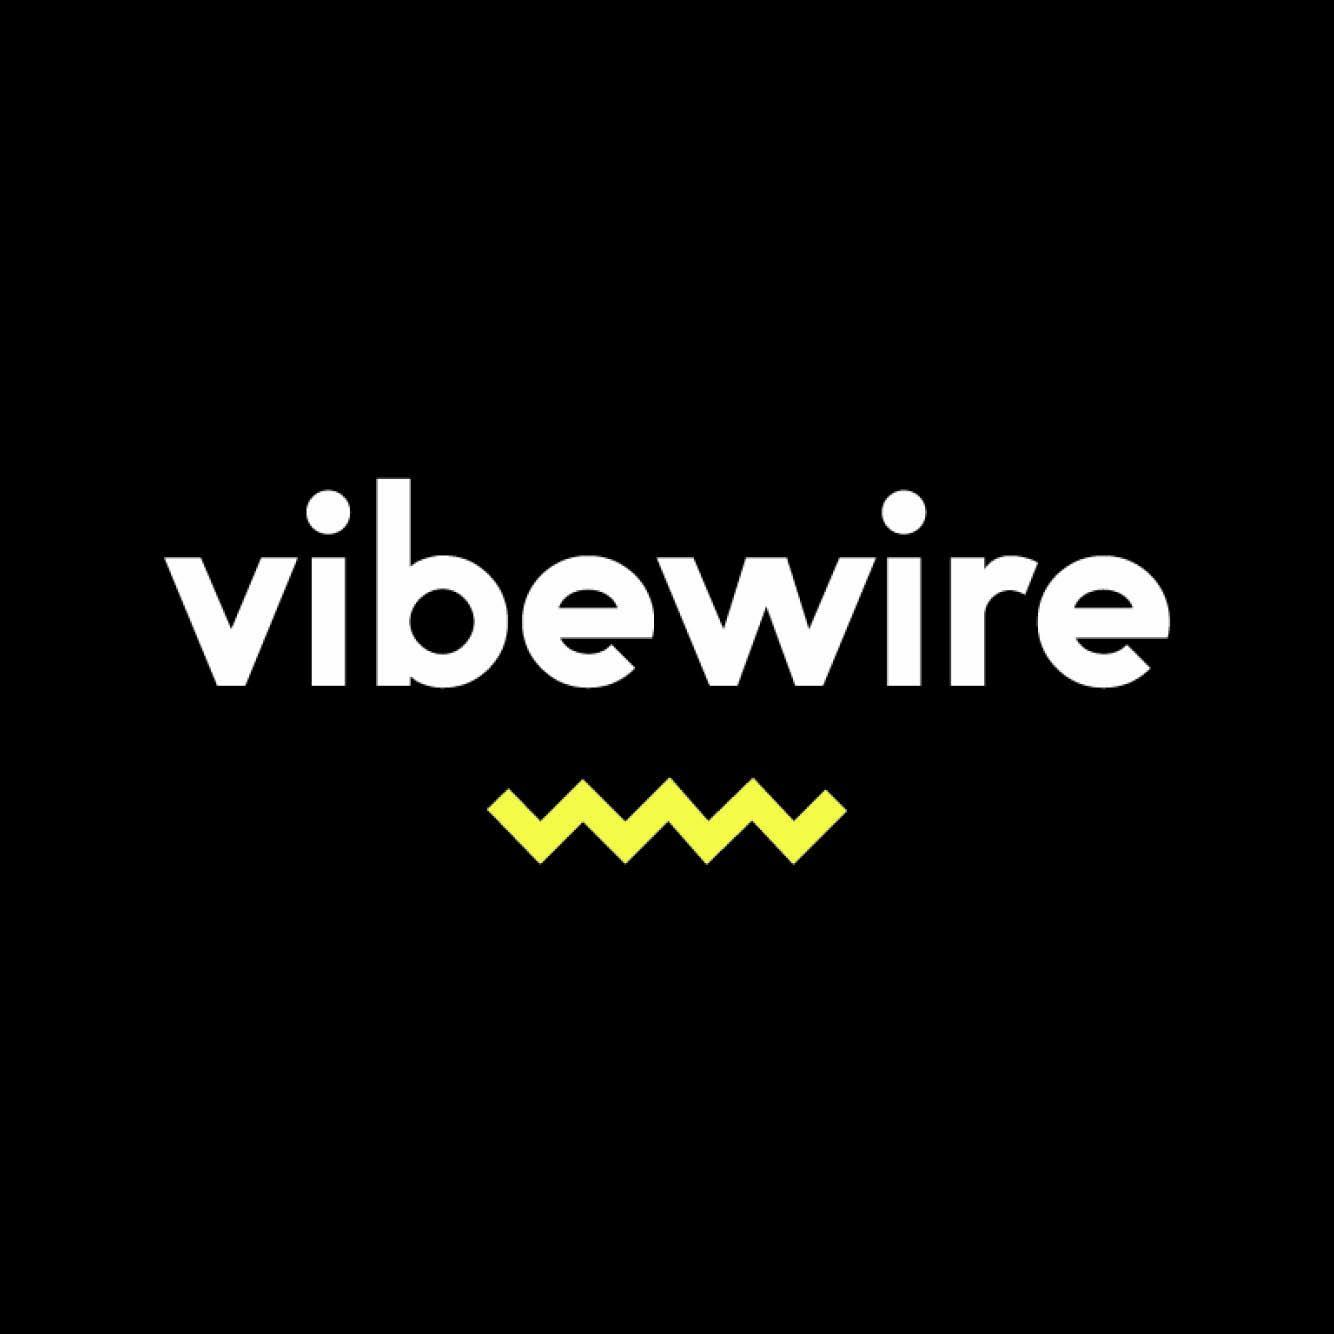 @vibewire